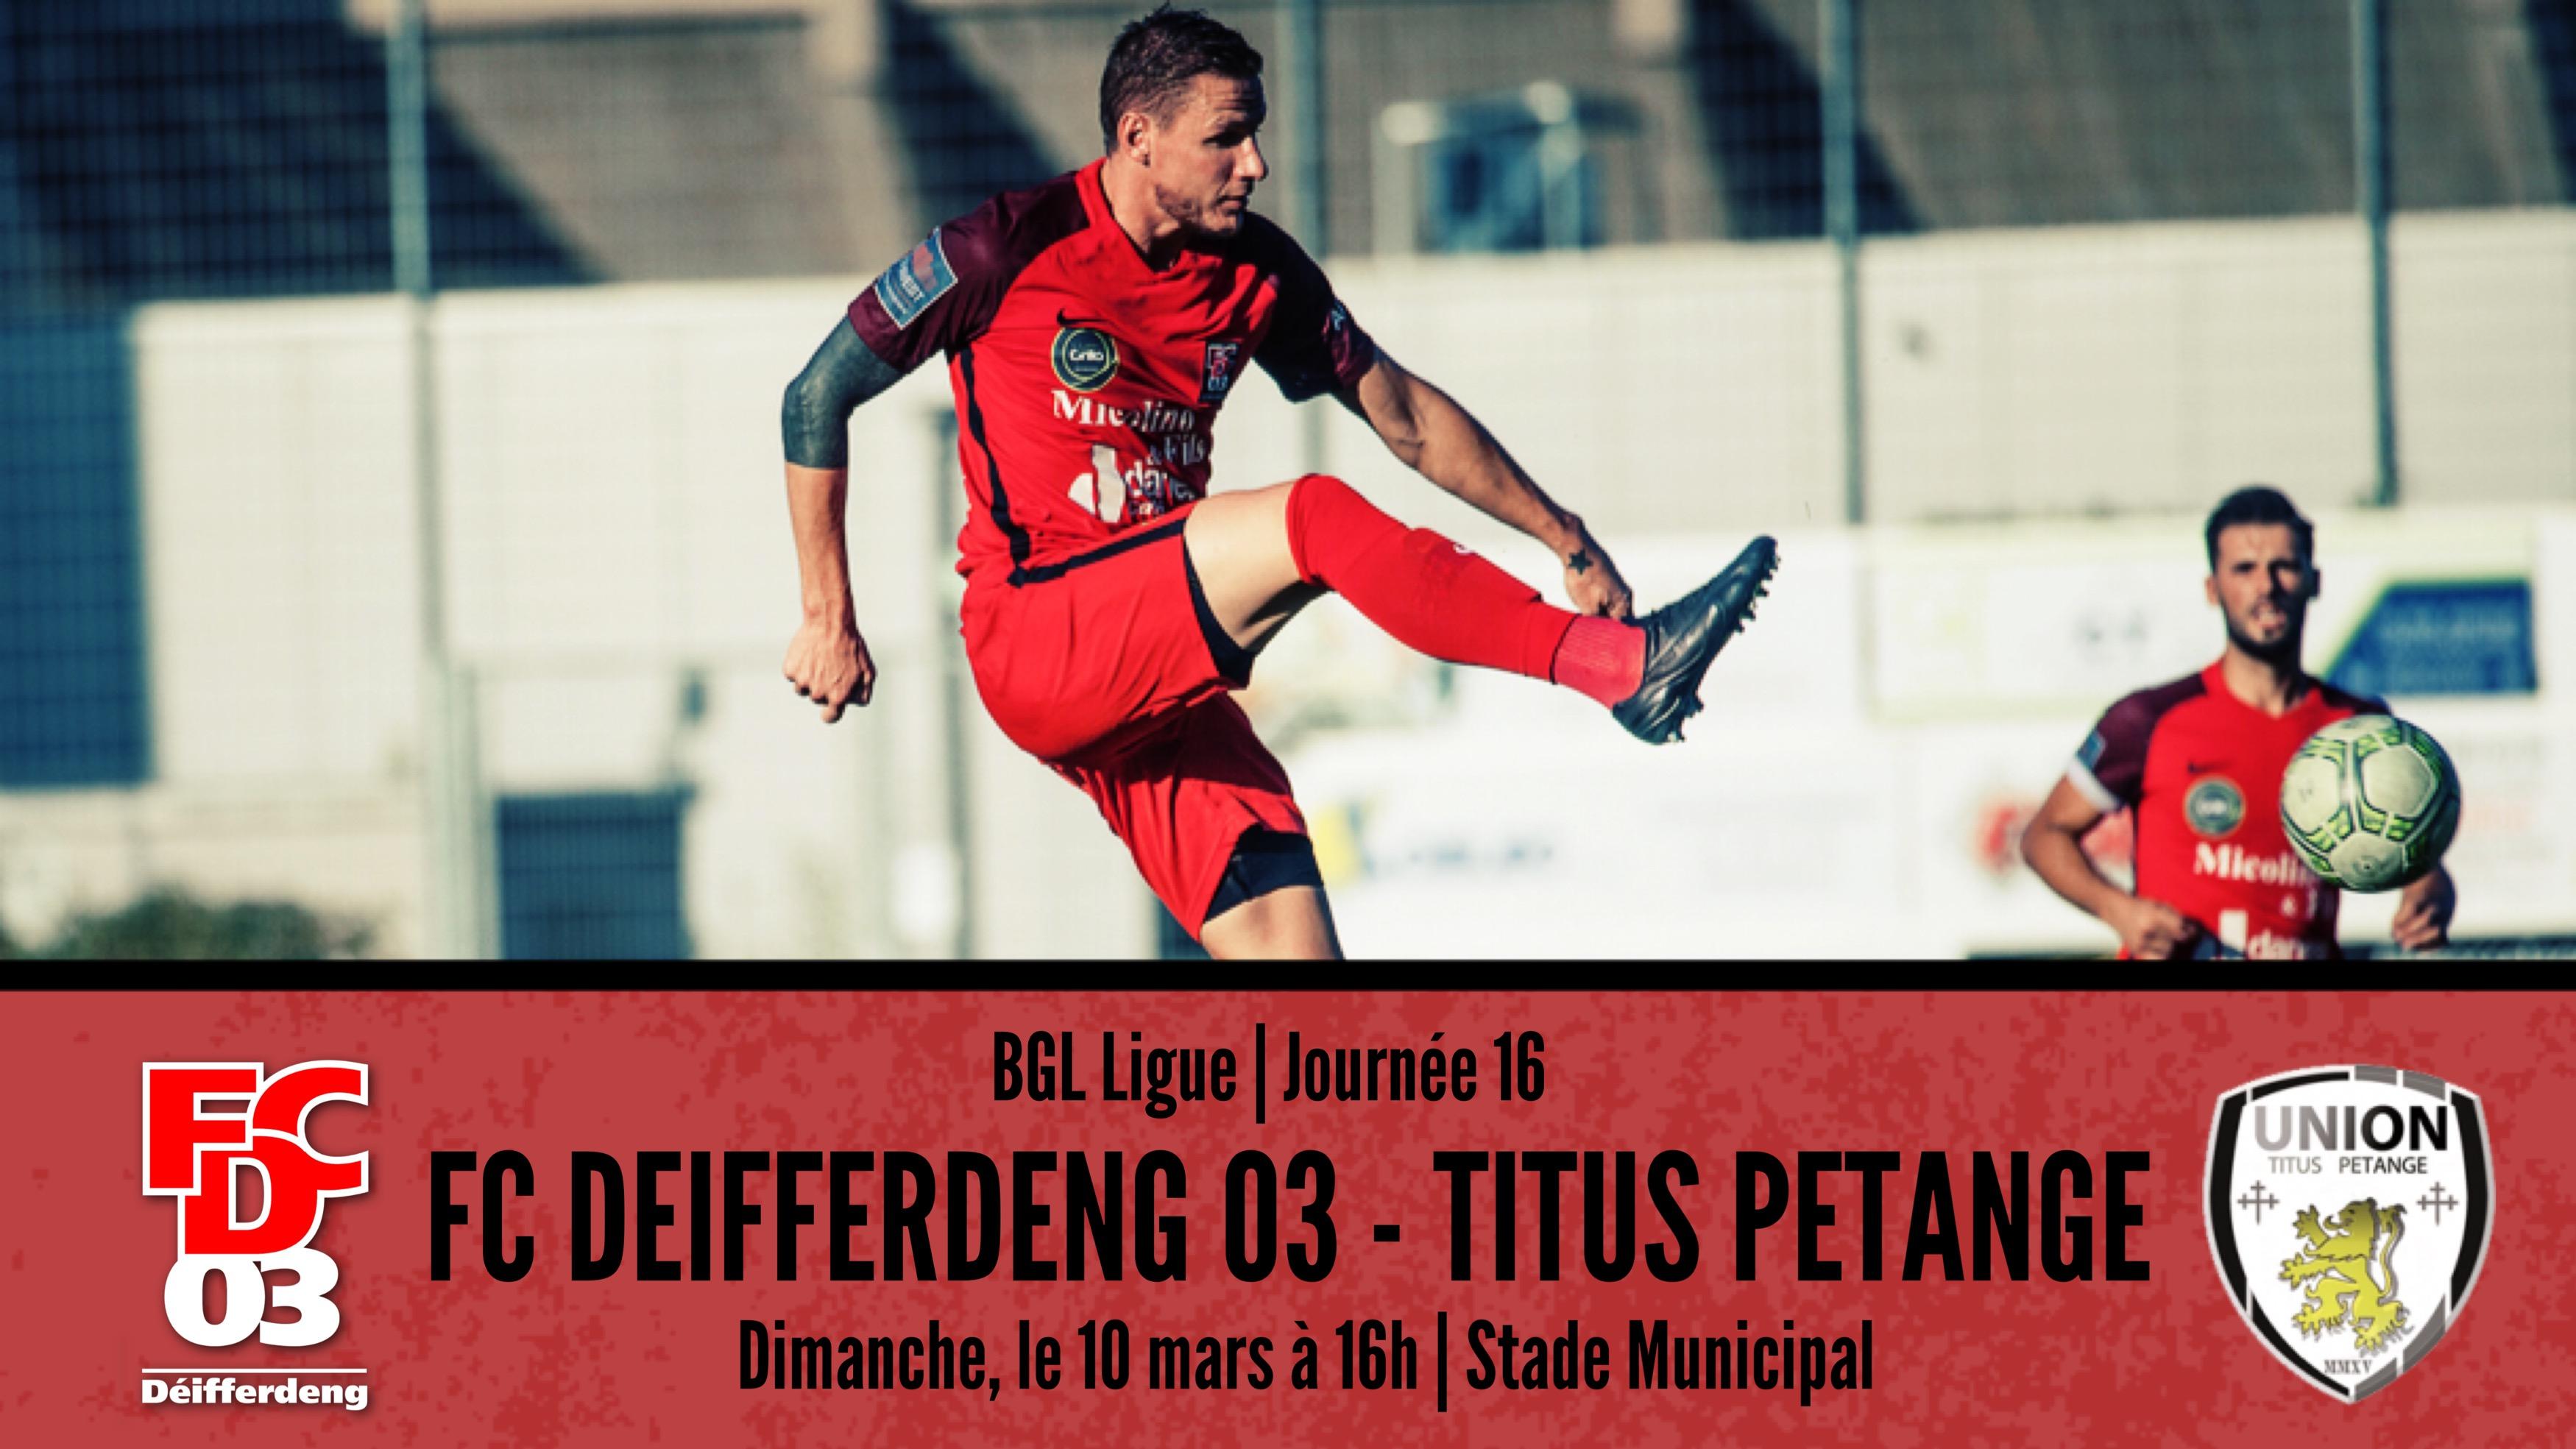 BGL Ligue FCD03 - UT Pétange